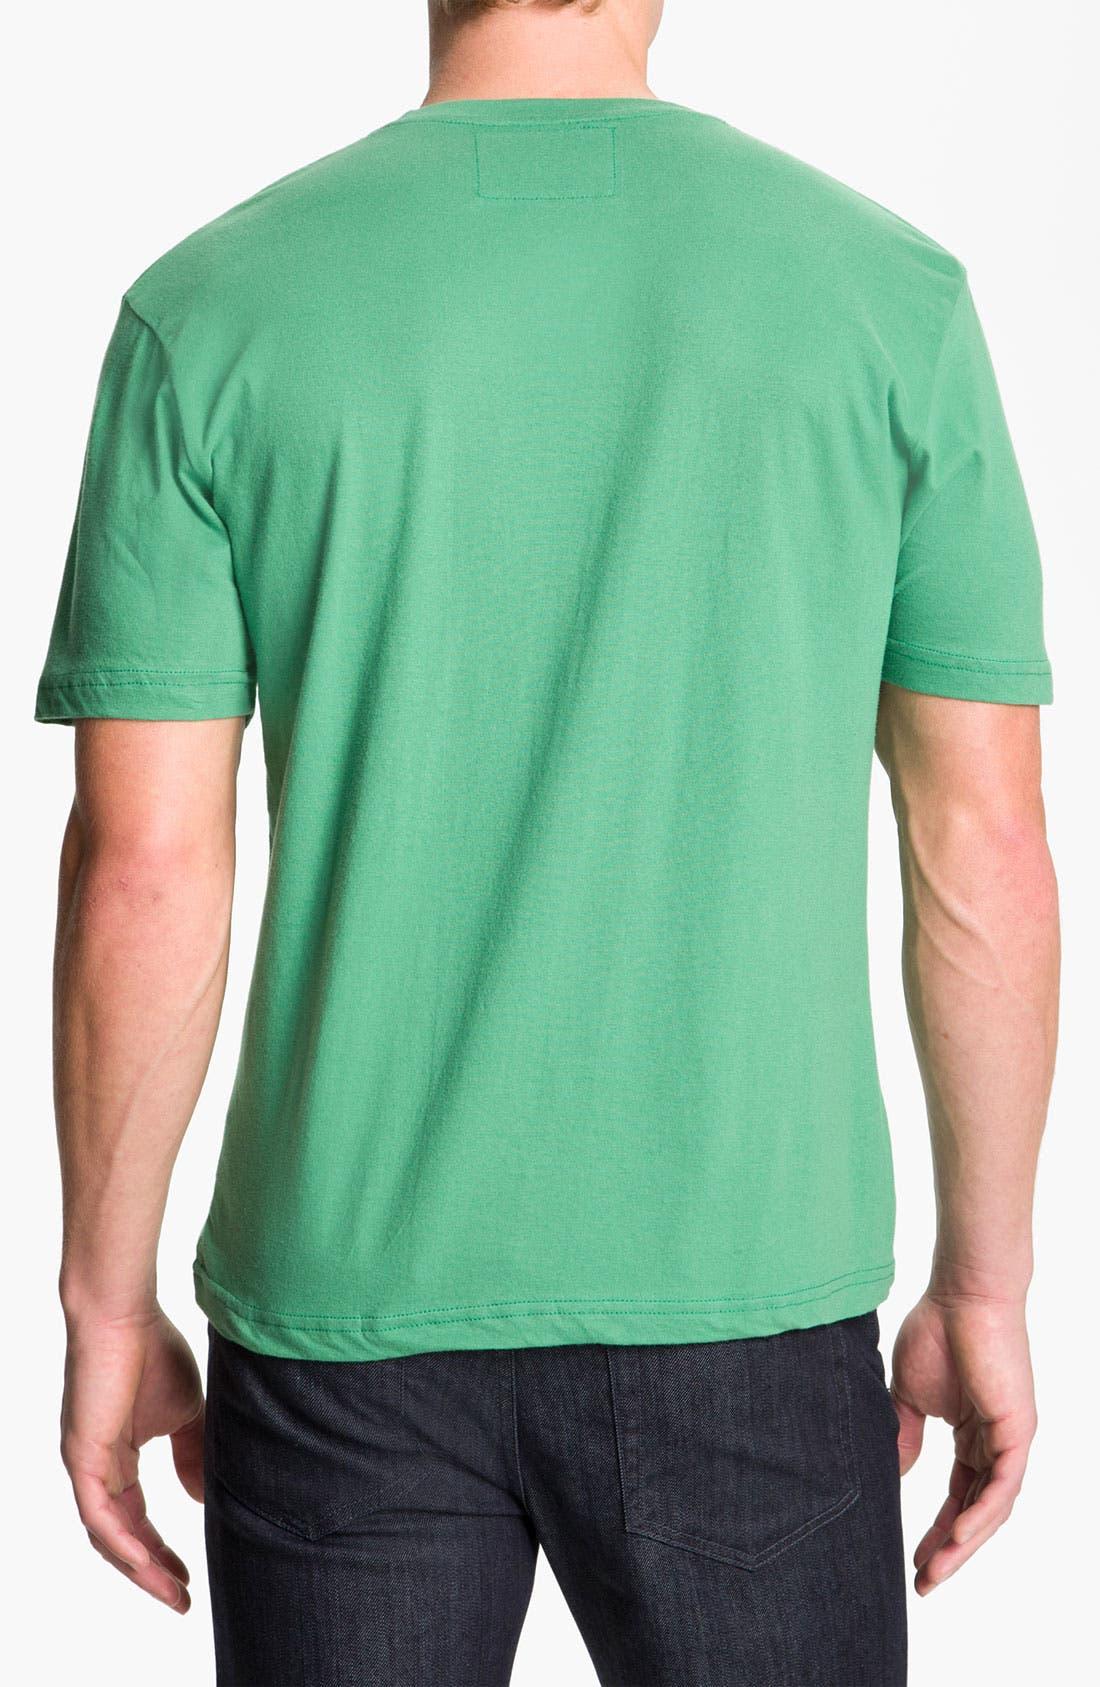 Alternate Image 2  - Wright & Ditson 'Oakland Athletics' Graphic T-Shirt